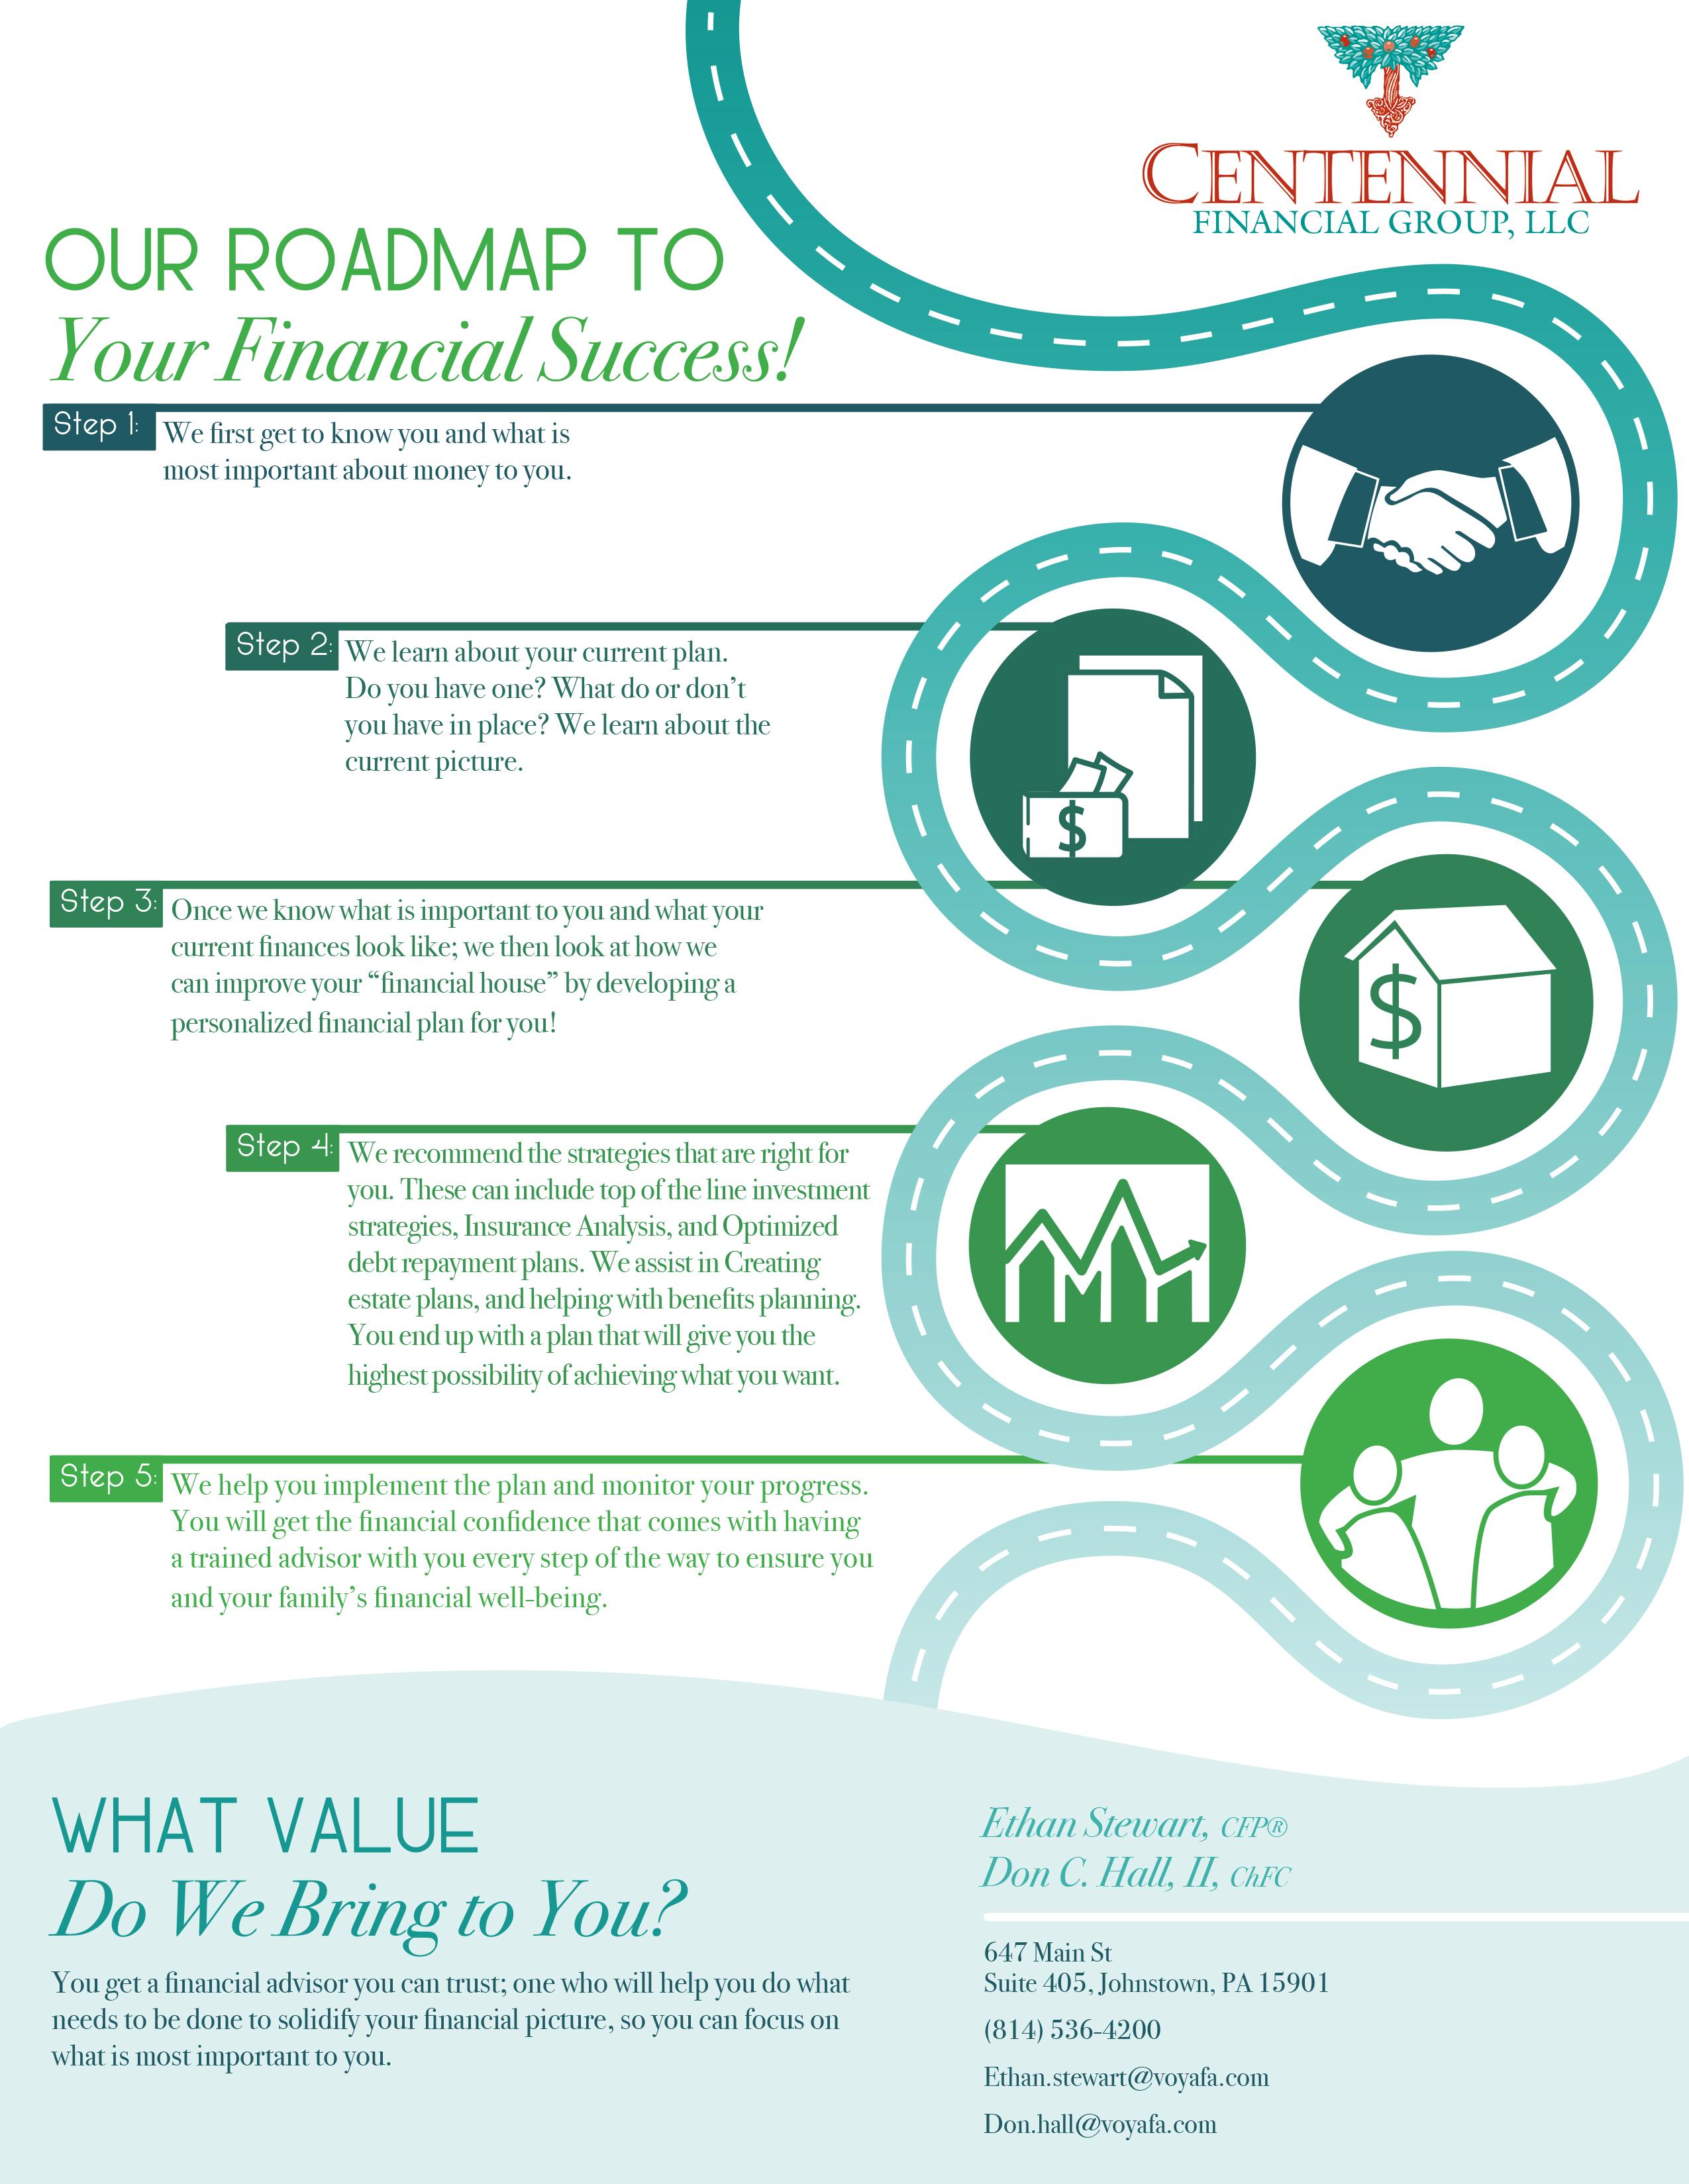 Our roadmap to your financial success Johnstown, PA Centennial Financial Group, LLC